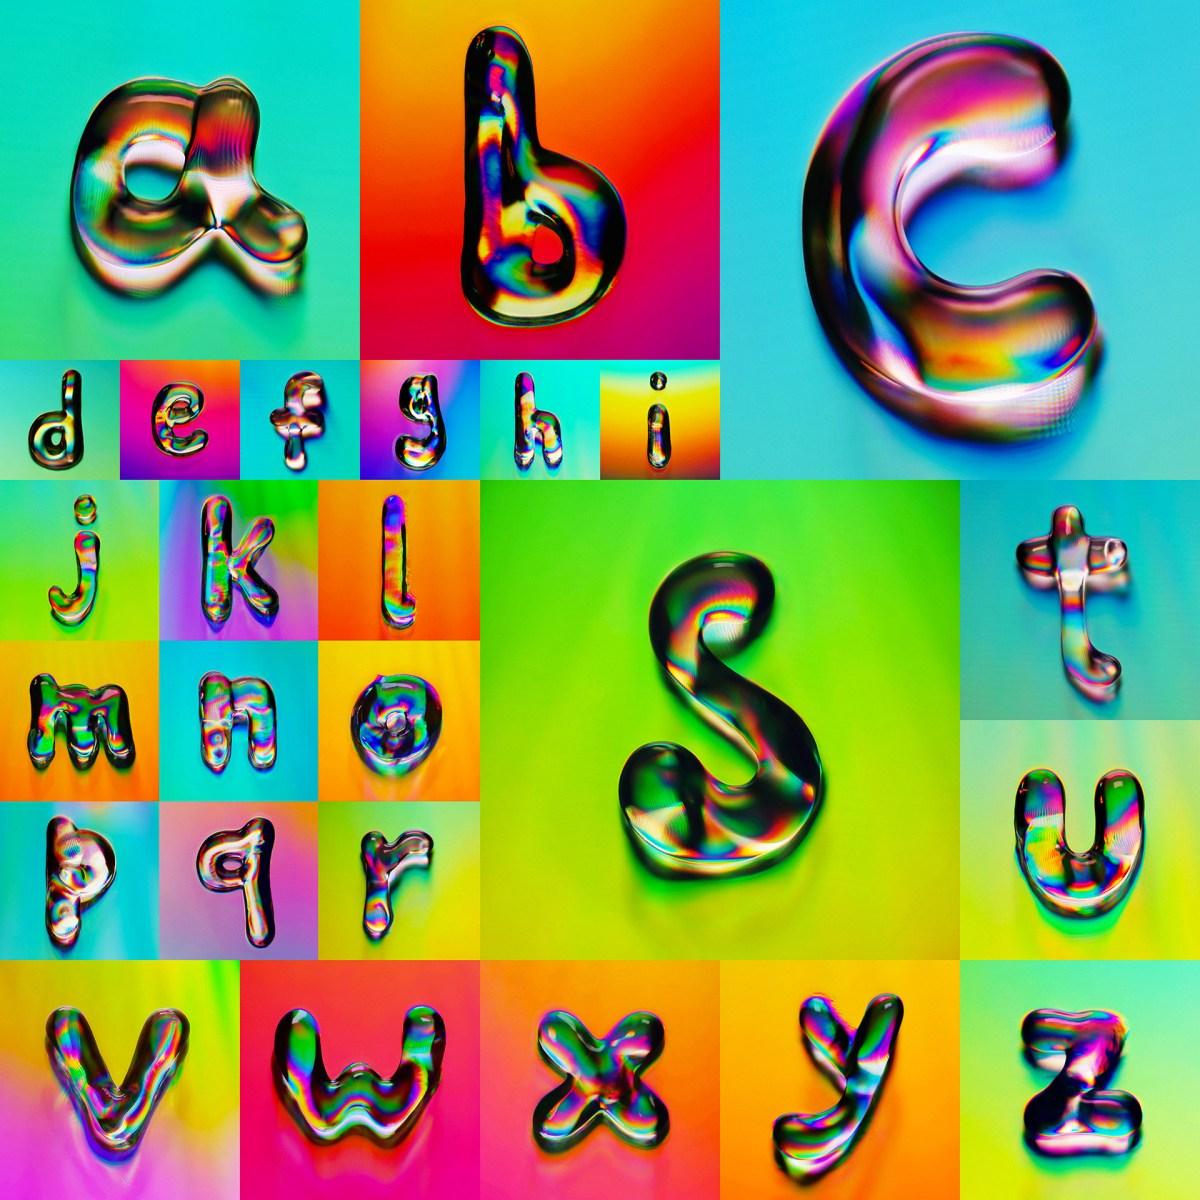 typography-marmalade-03